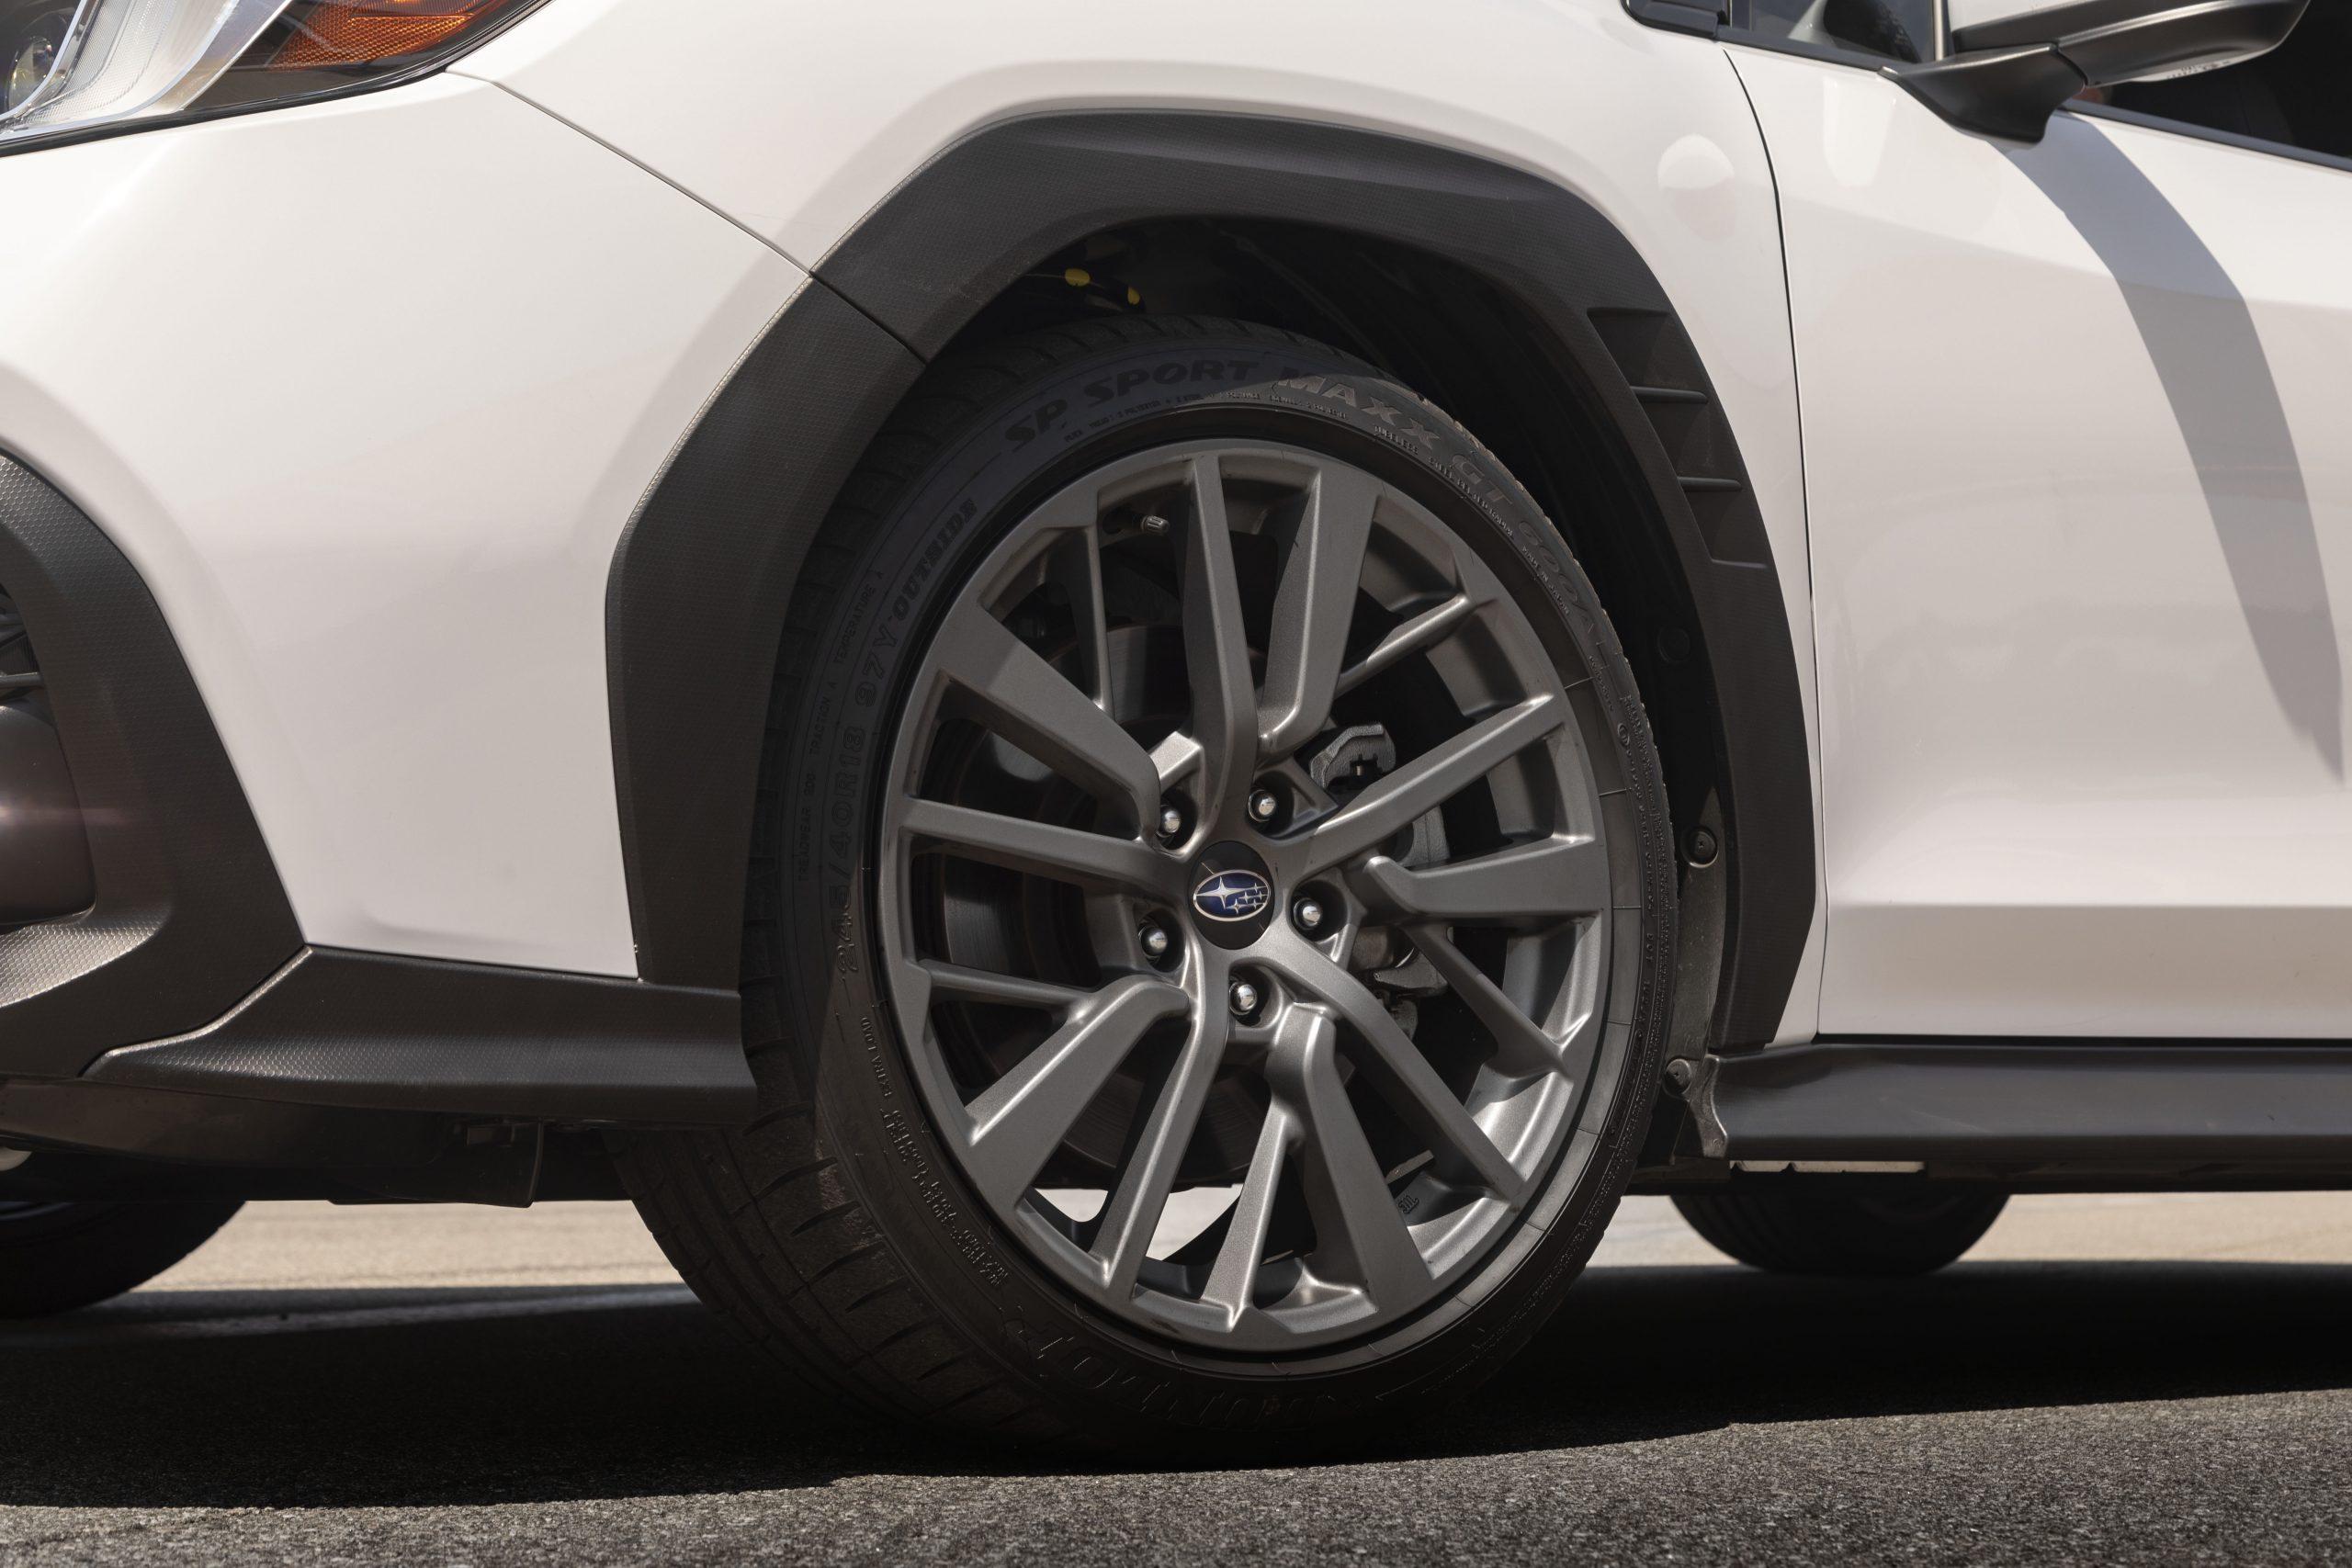 2022 Subaru WRX white wheel tire trim